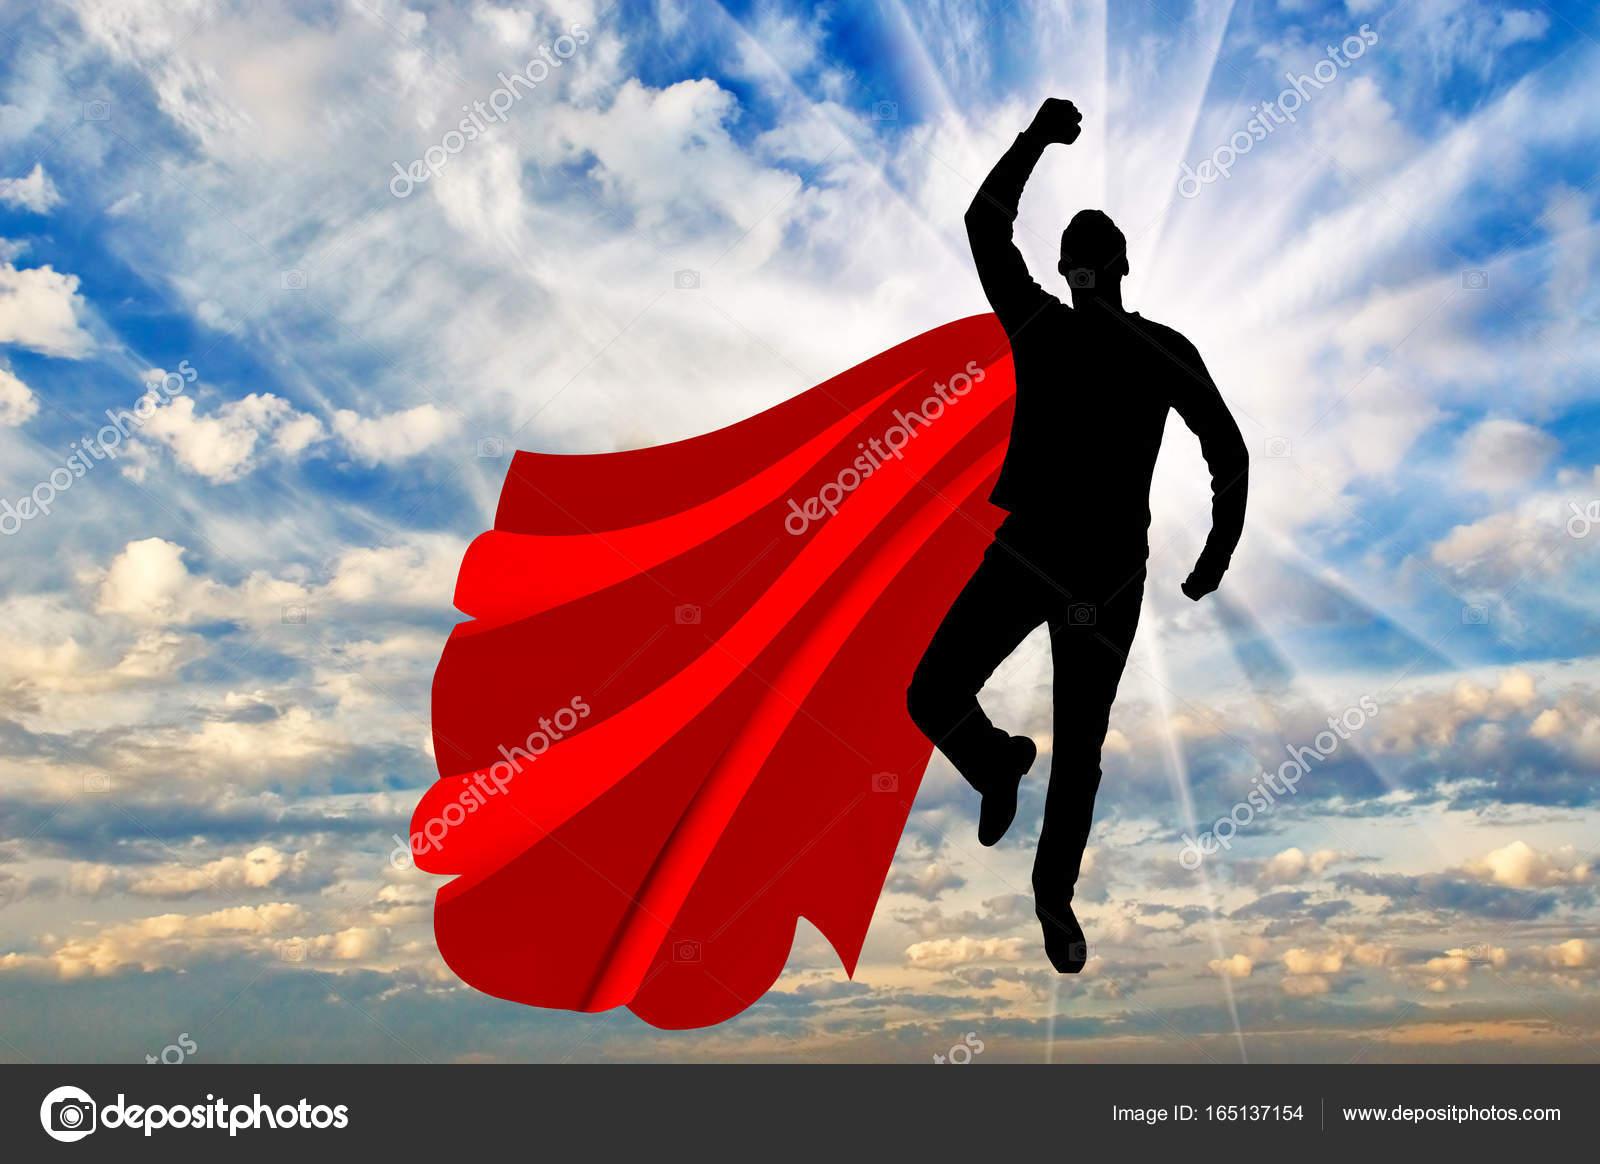 Superman businessman superhero stock photo prazisss 165137154 superman businessman superhero silhouette of a businessman in the image of a superman flying in the sky photo by prazisss publicscrutiny Gallery